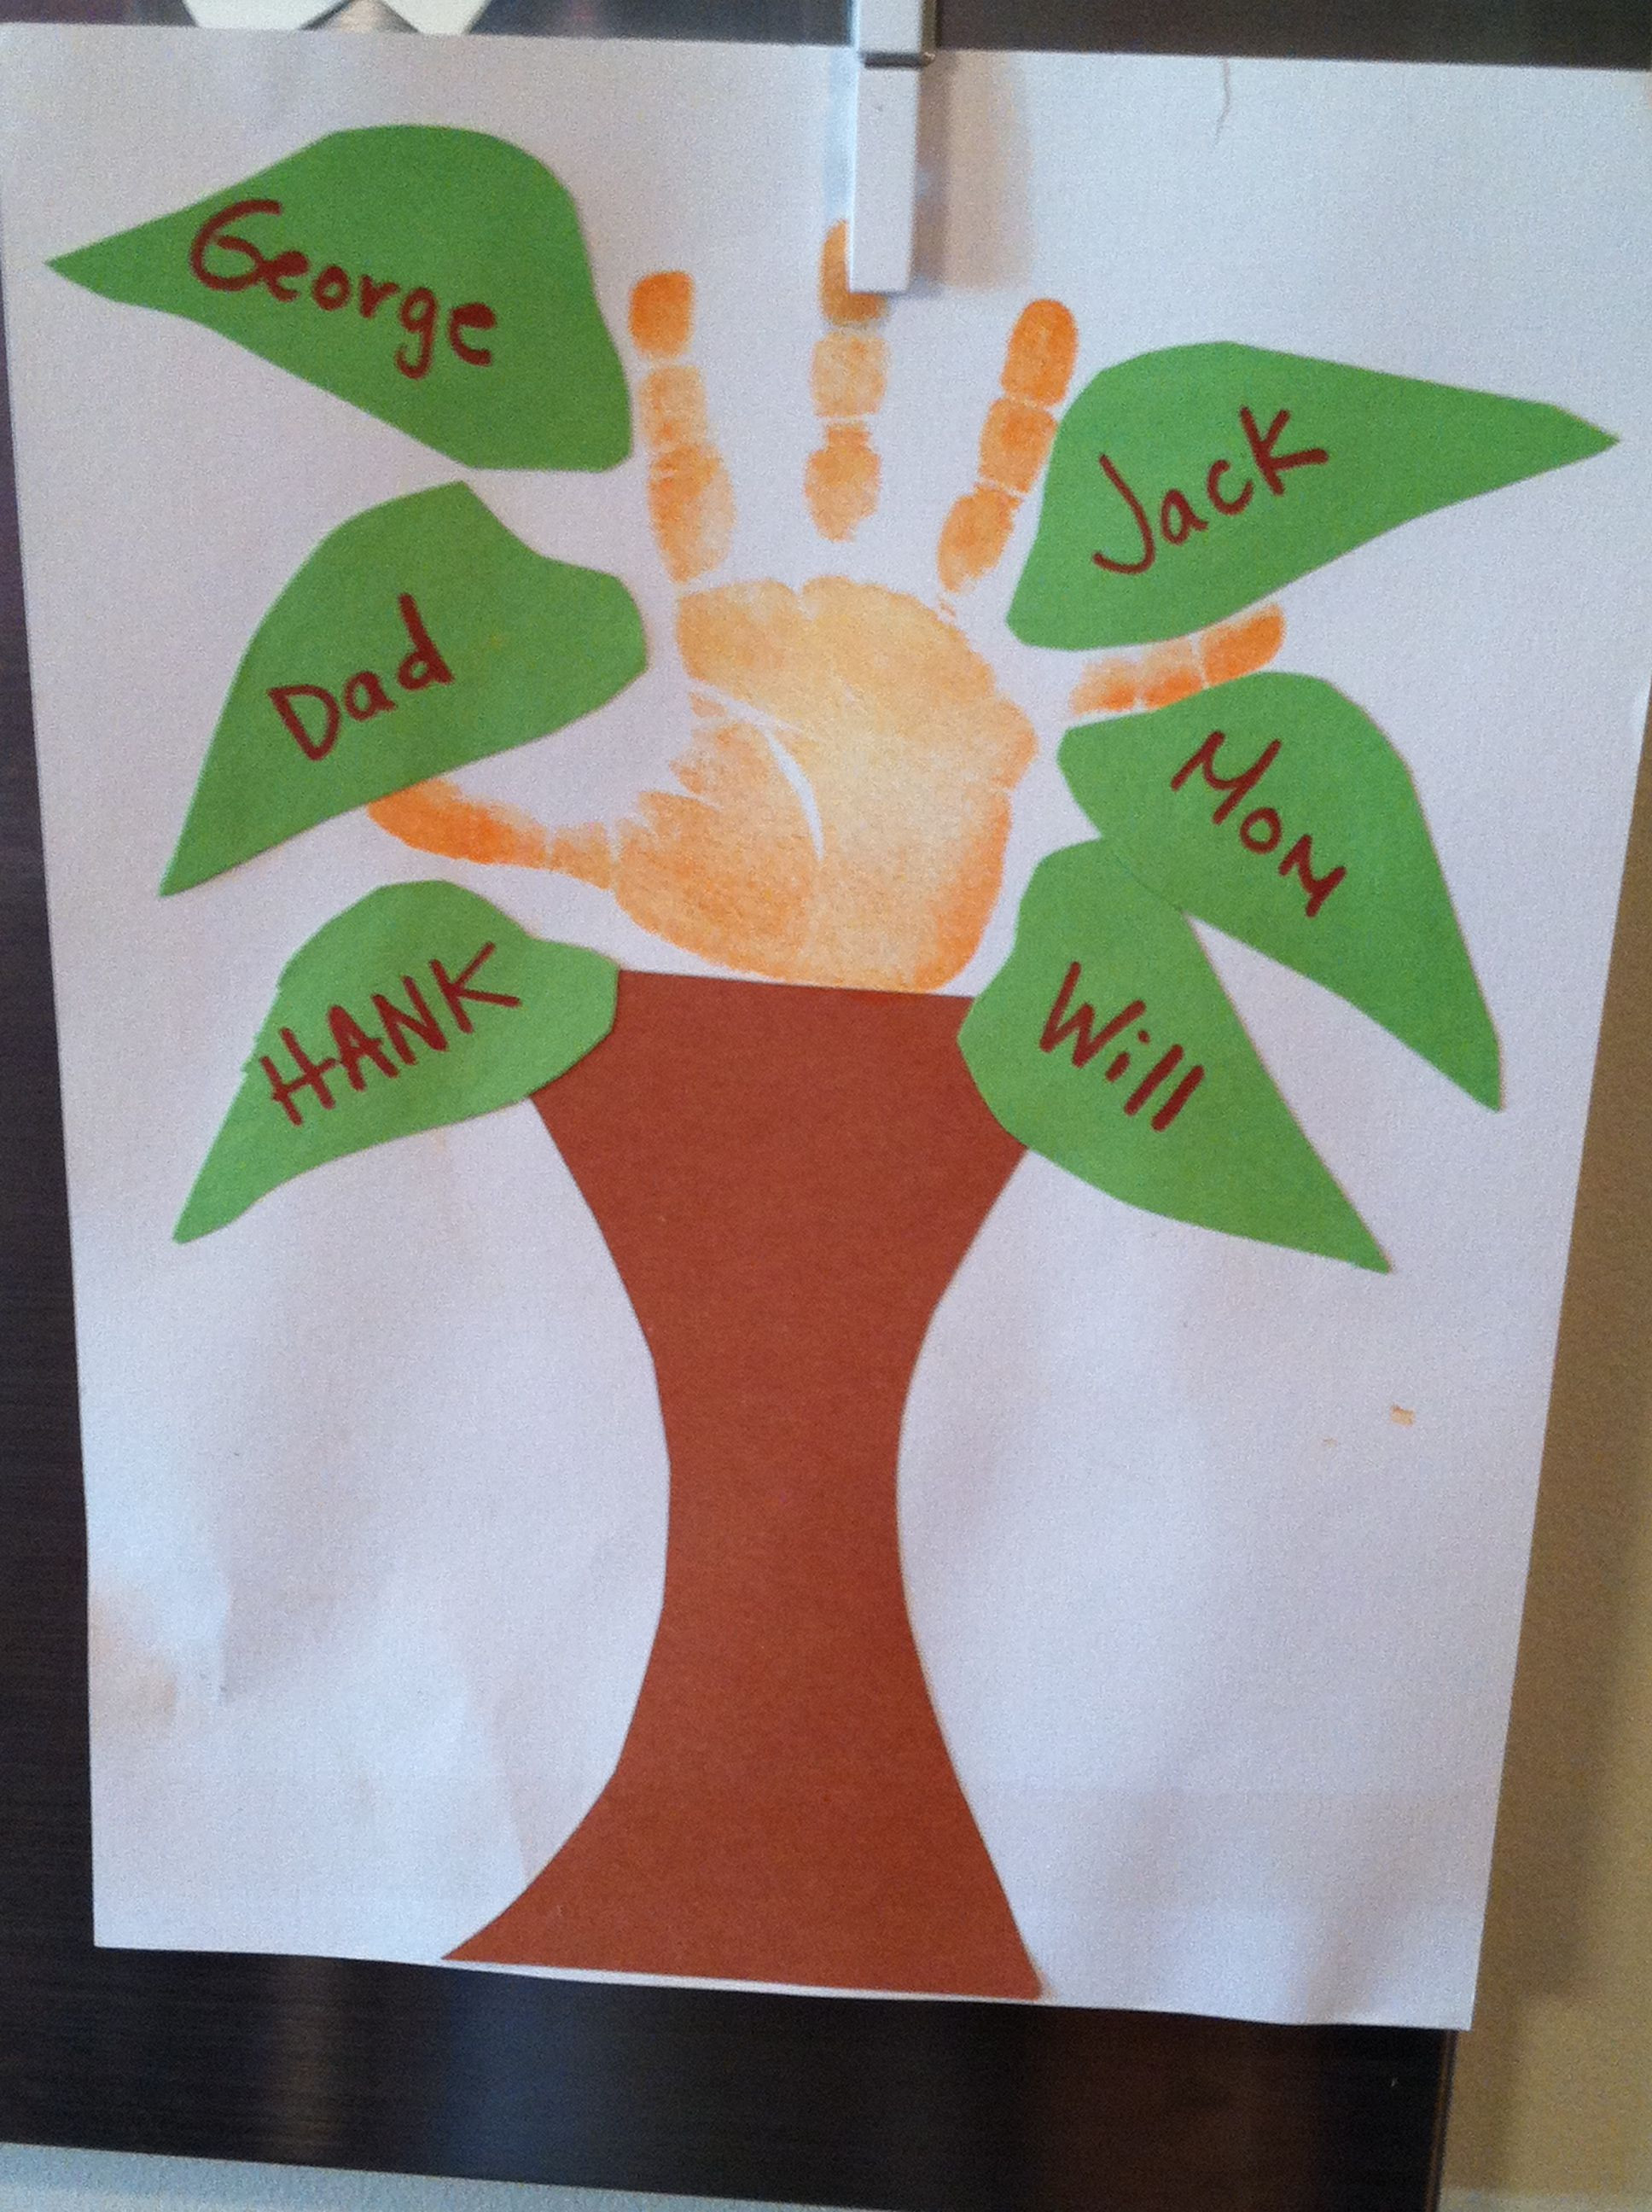 Best ideas about Preschool Art Projects . Save or Pin Family tree handprint art Preschool project Now.